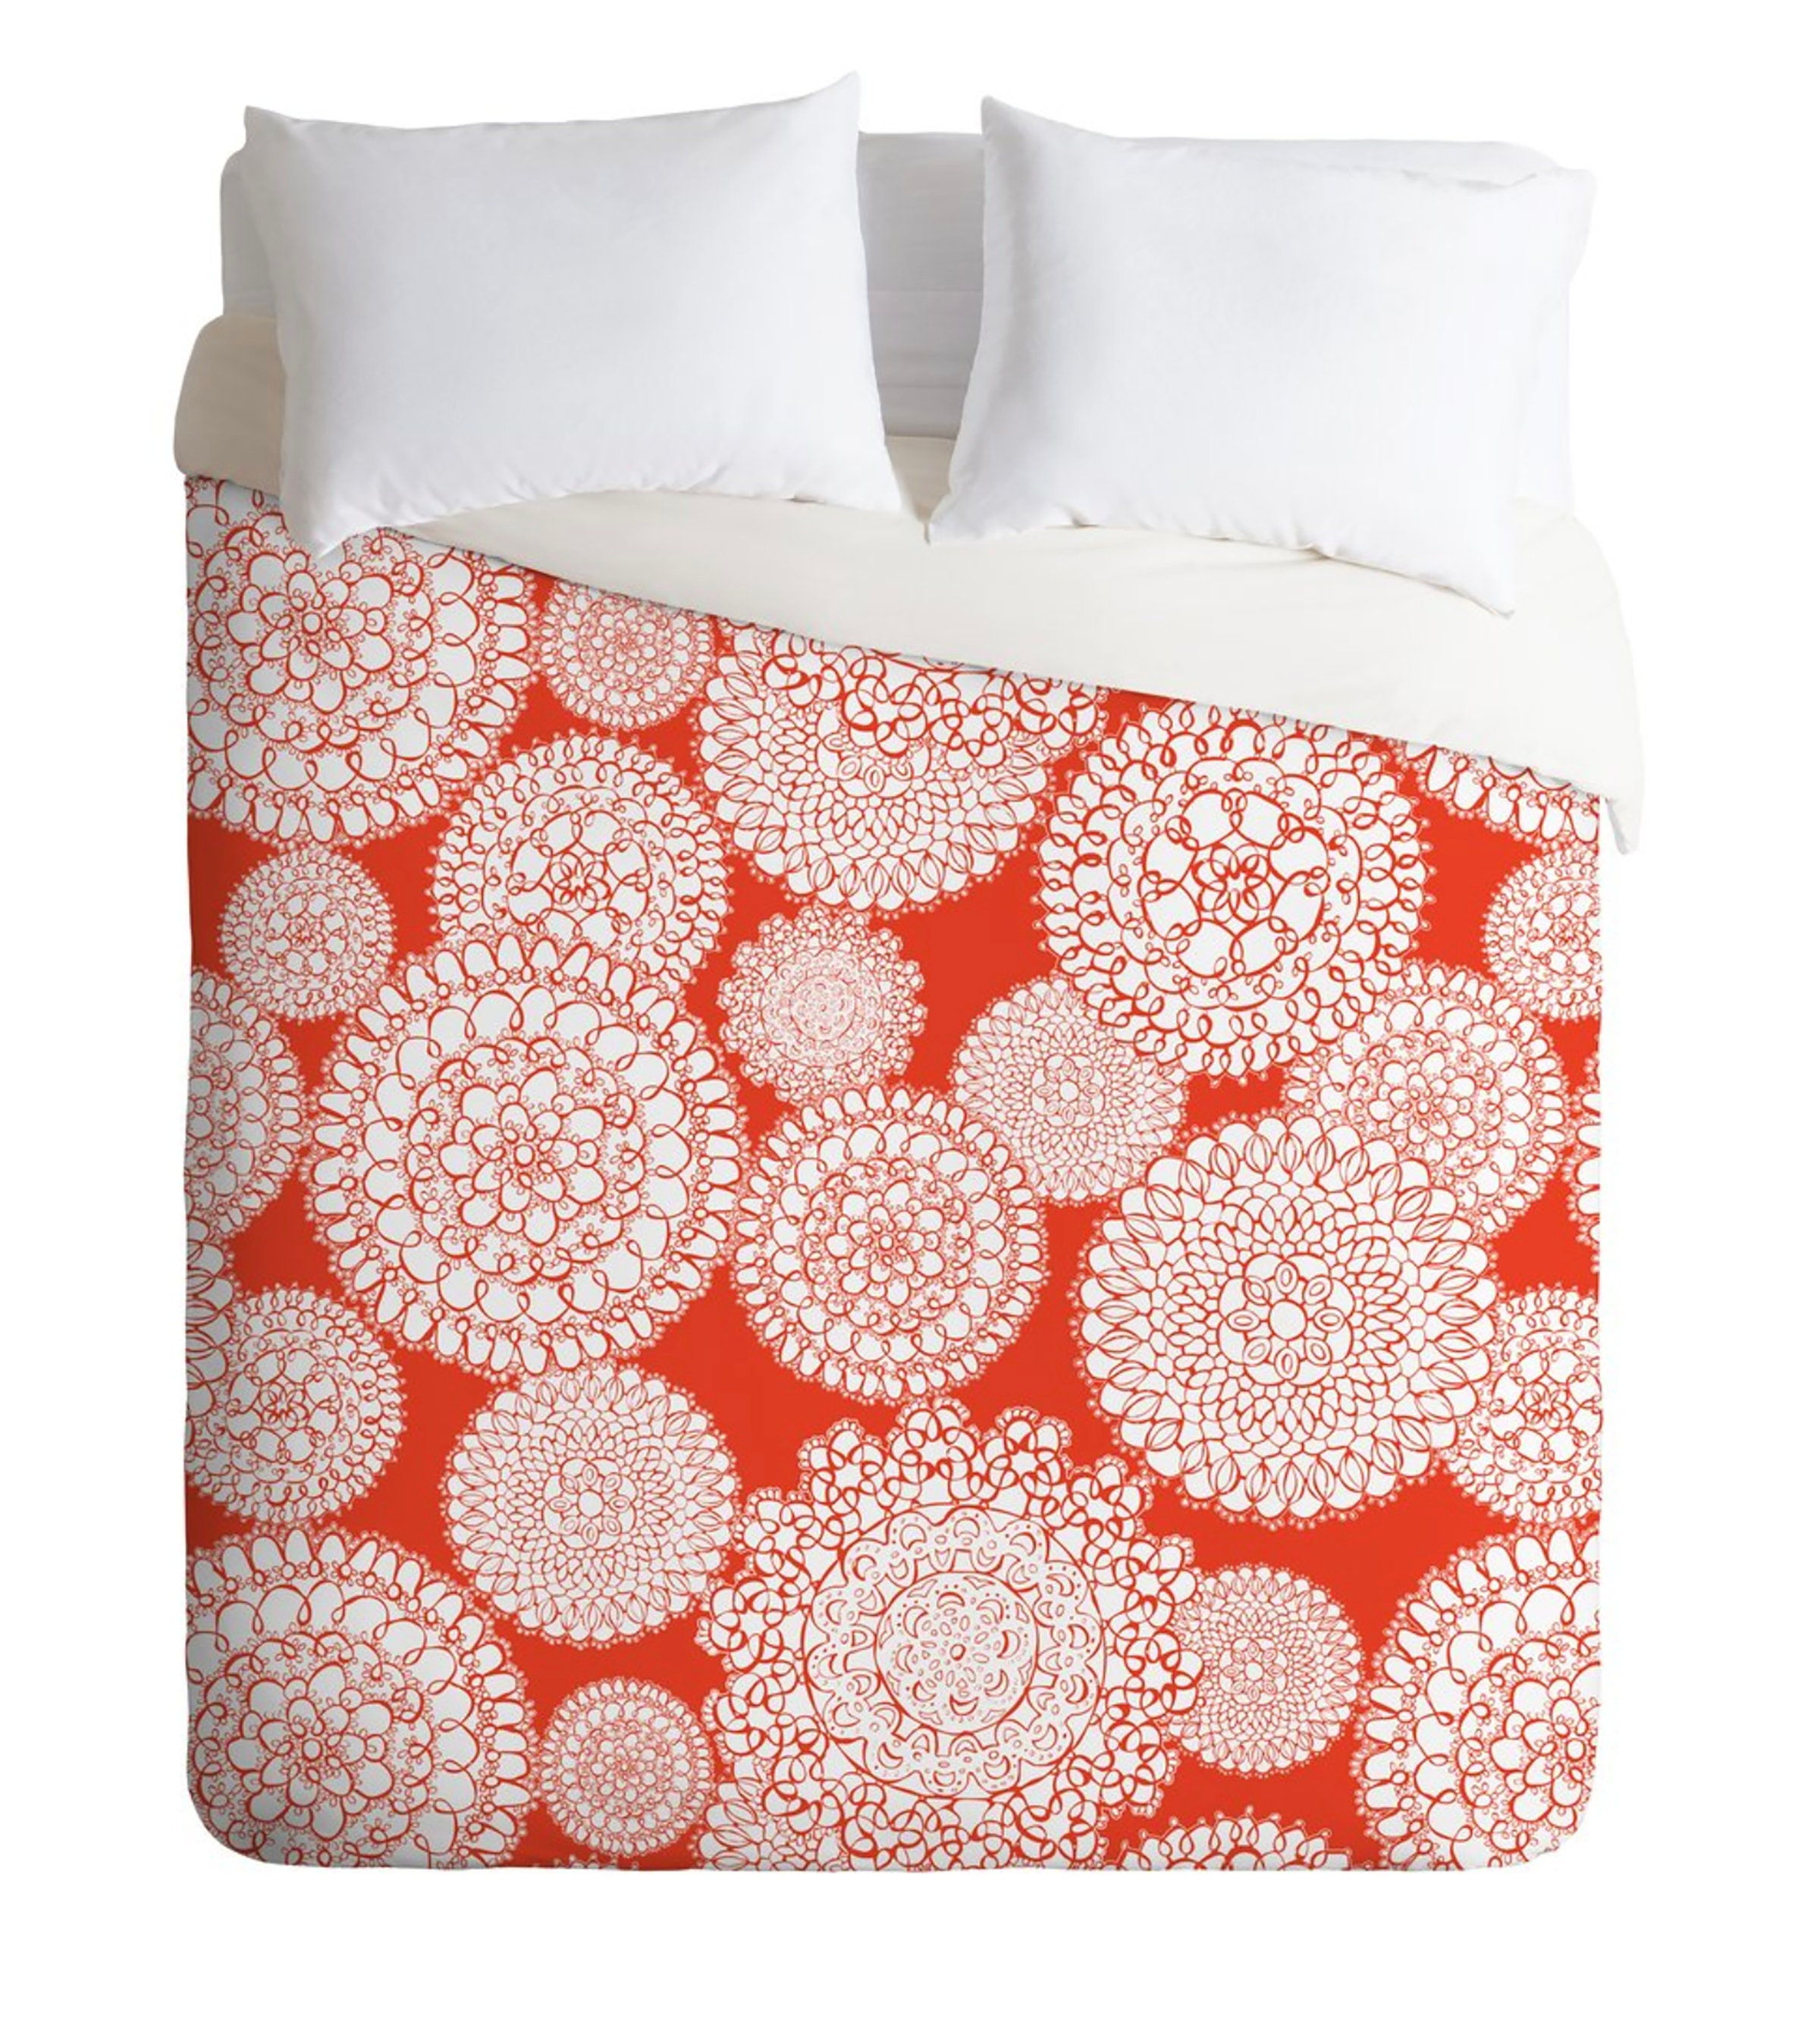 Boho Duvet Cover // Literie // Twin, Queen, King Sizes // Home Decor // Delightful Doilies Saffron Orange Design // Bold // Bedroom // Boho